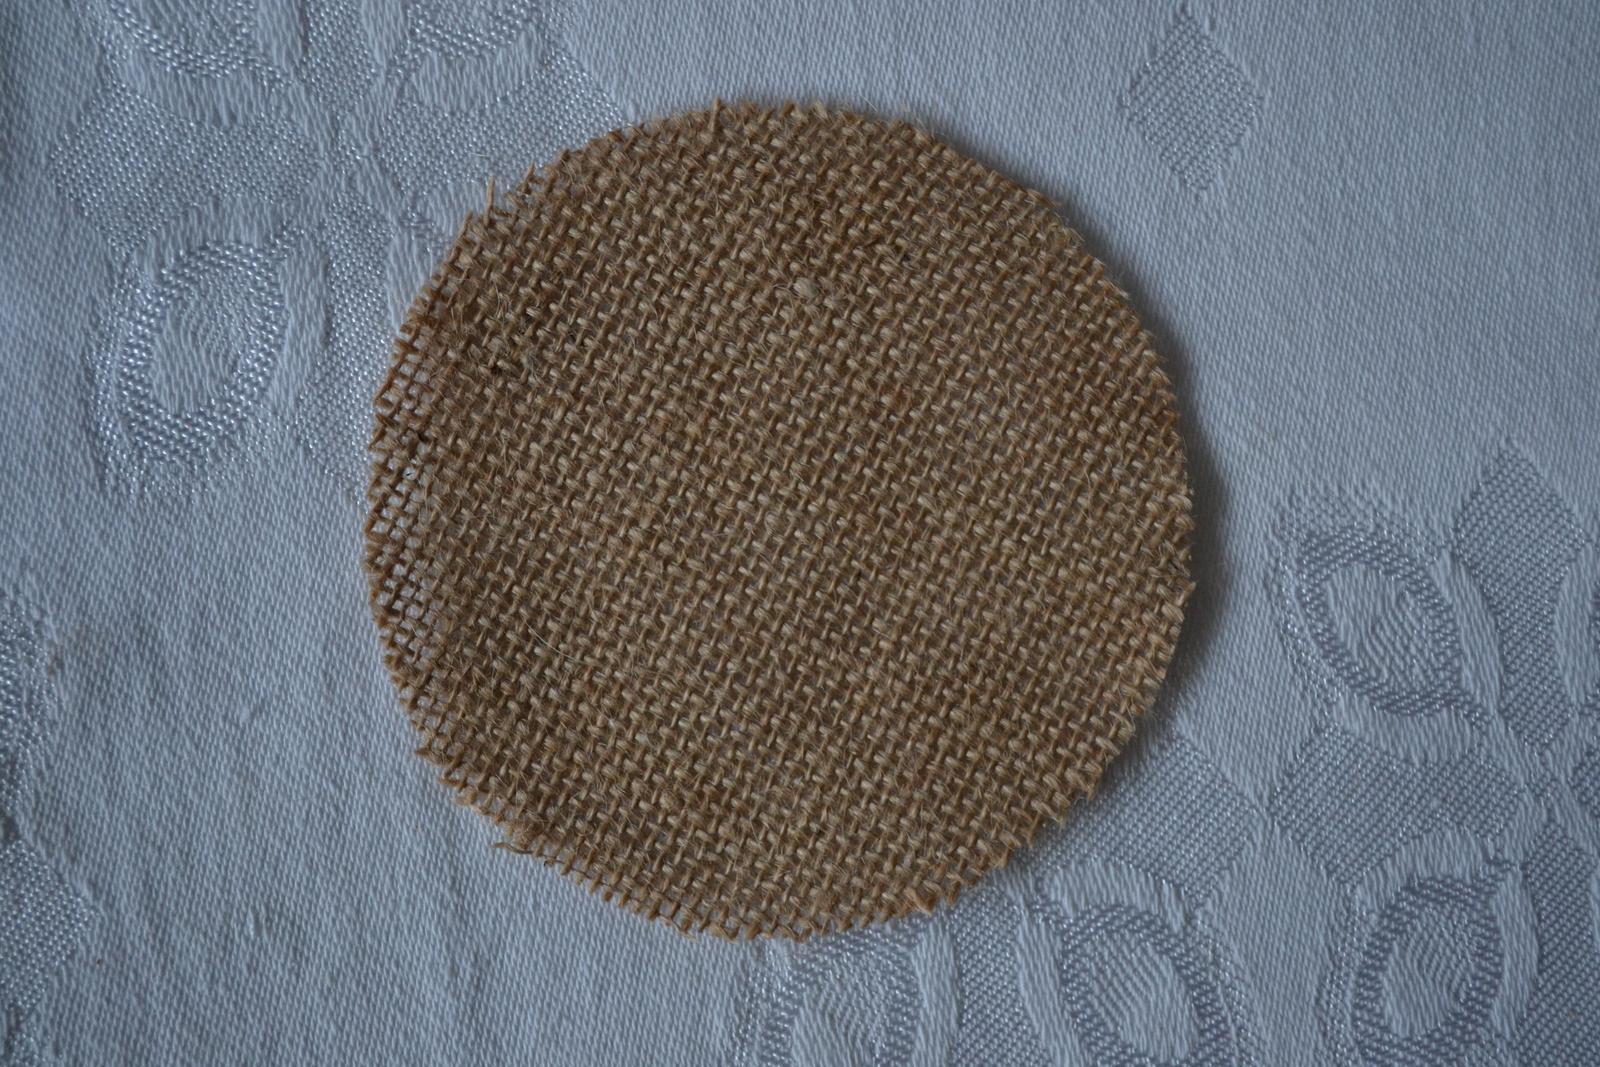 Juta - Jutové kruhy priemer 11cm - Obrázok č. 1